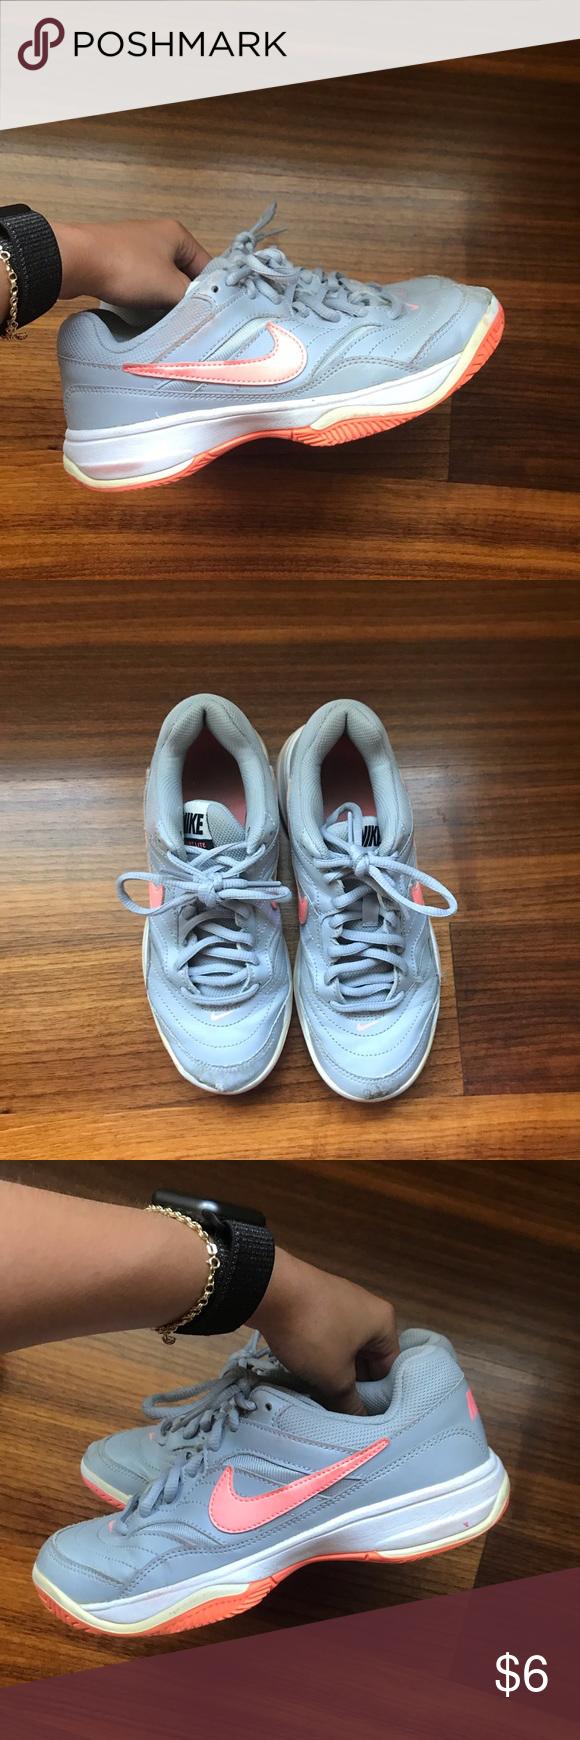 Nike Court Lite Tennis Shoes Fashion Trends Clothes Design Fashion